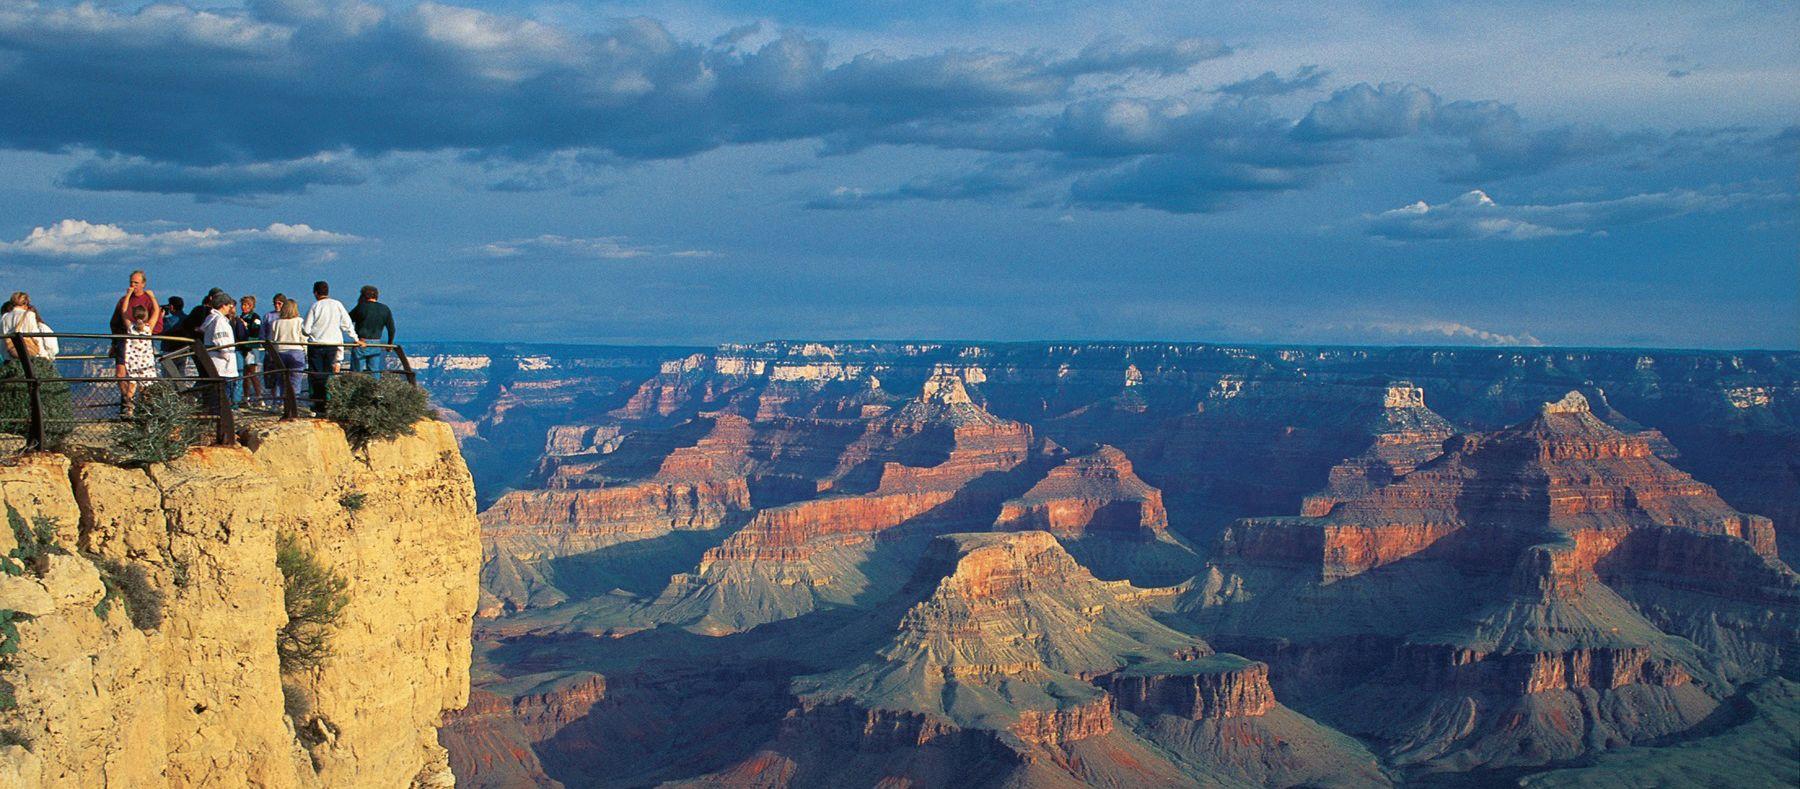 Blick auf den Grand Canyon National Park, Arizona